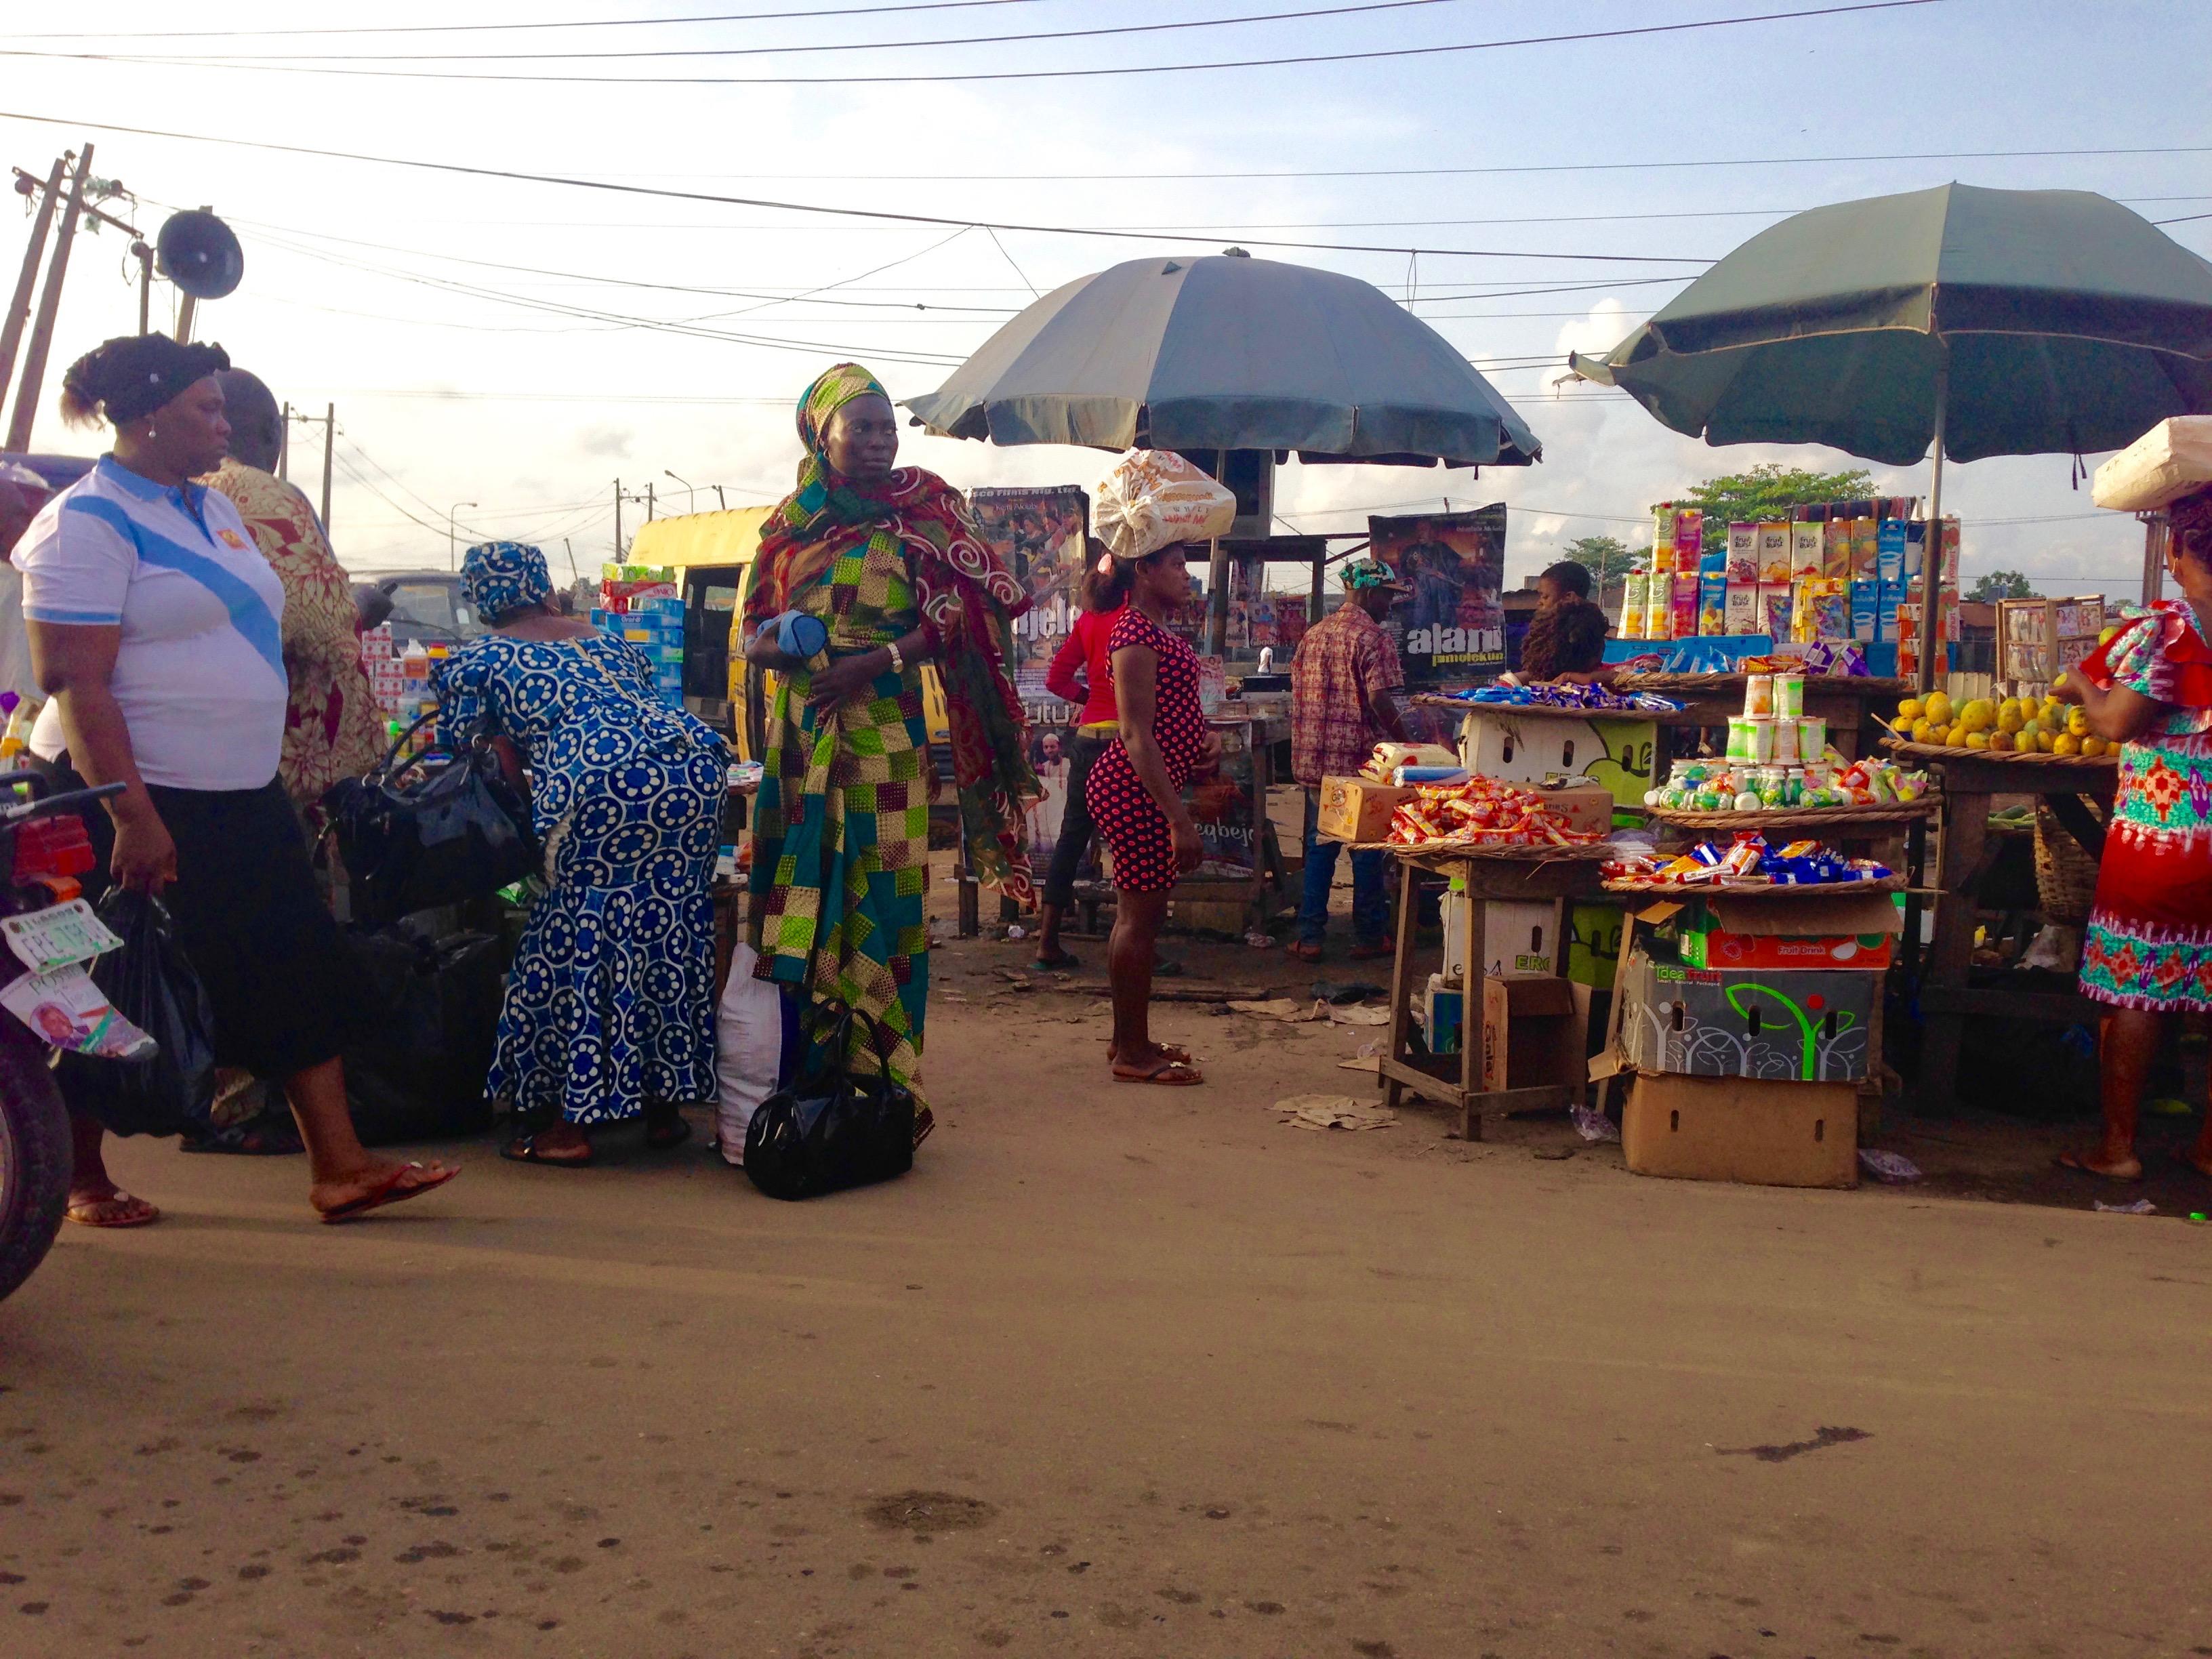 Iyano Oba Market in Lagos Nigeria